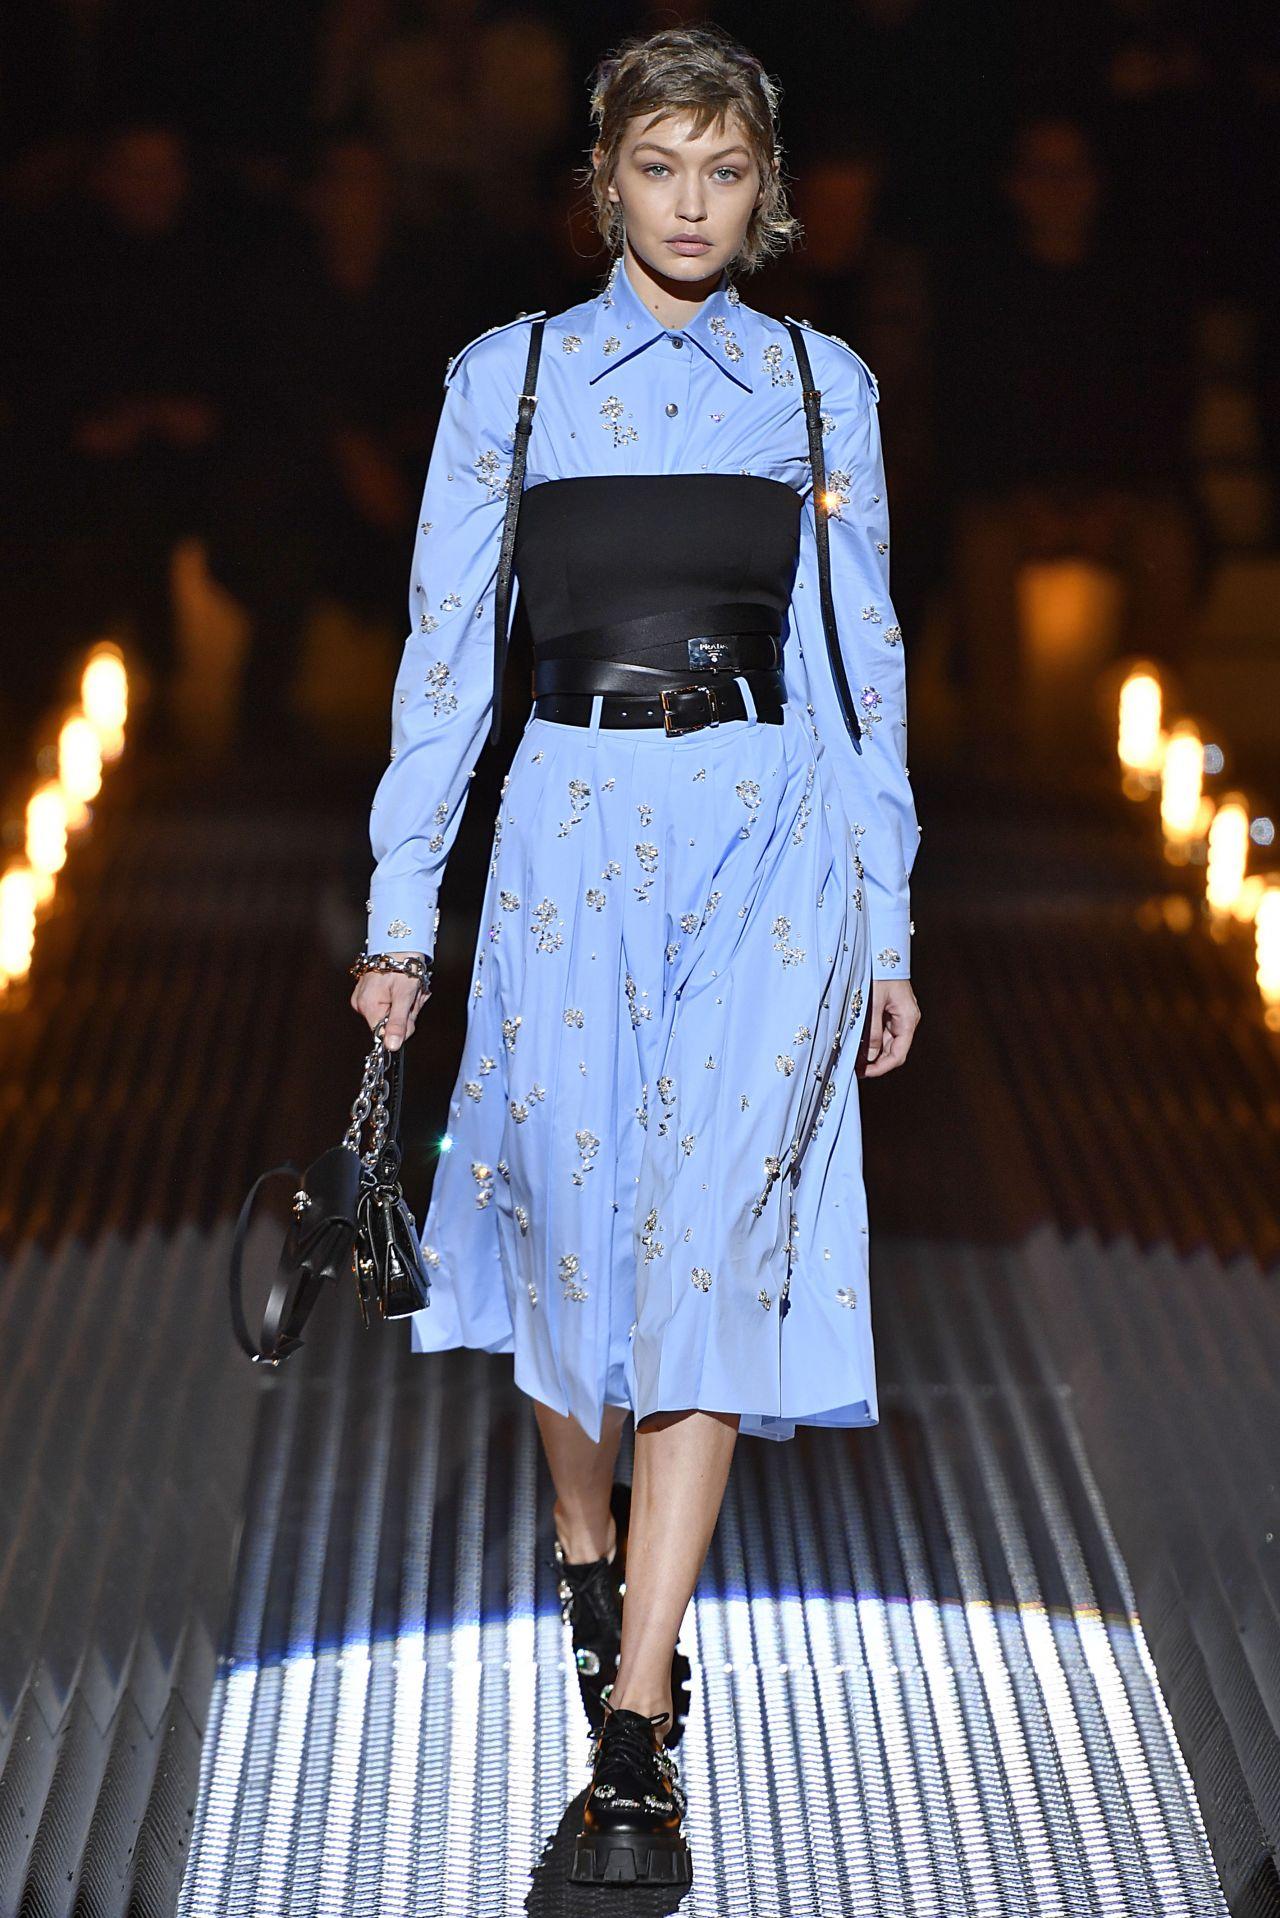 Gigi Hadid Walks Prada Show In Milan 01 13 2019